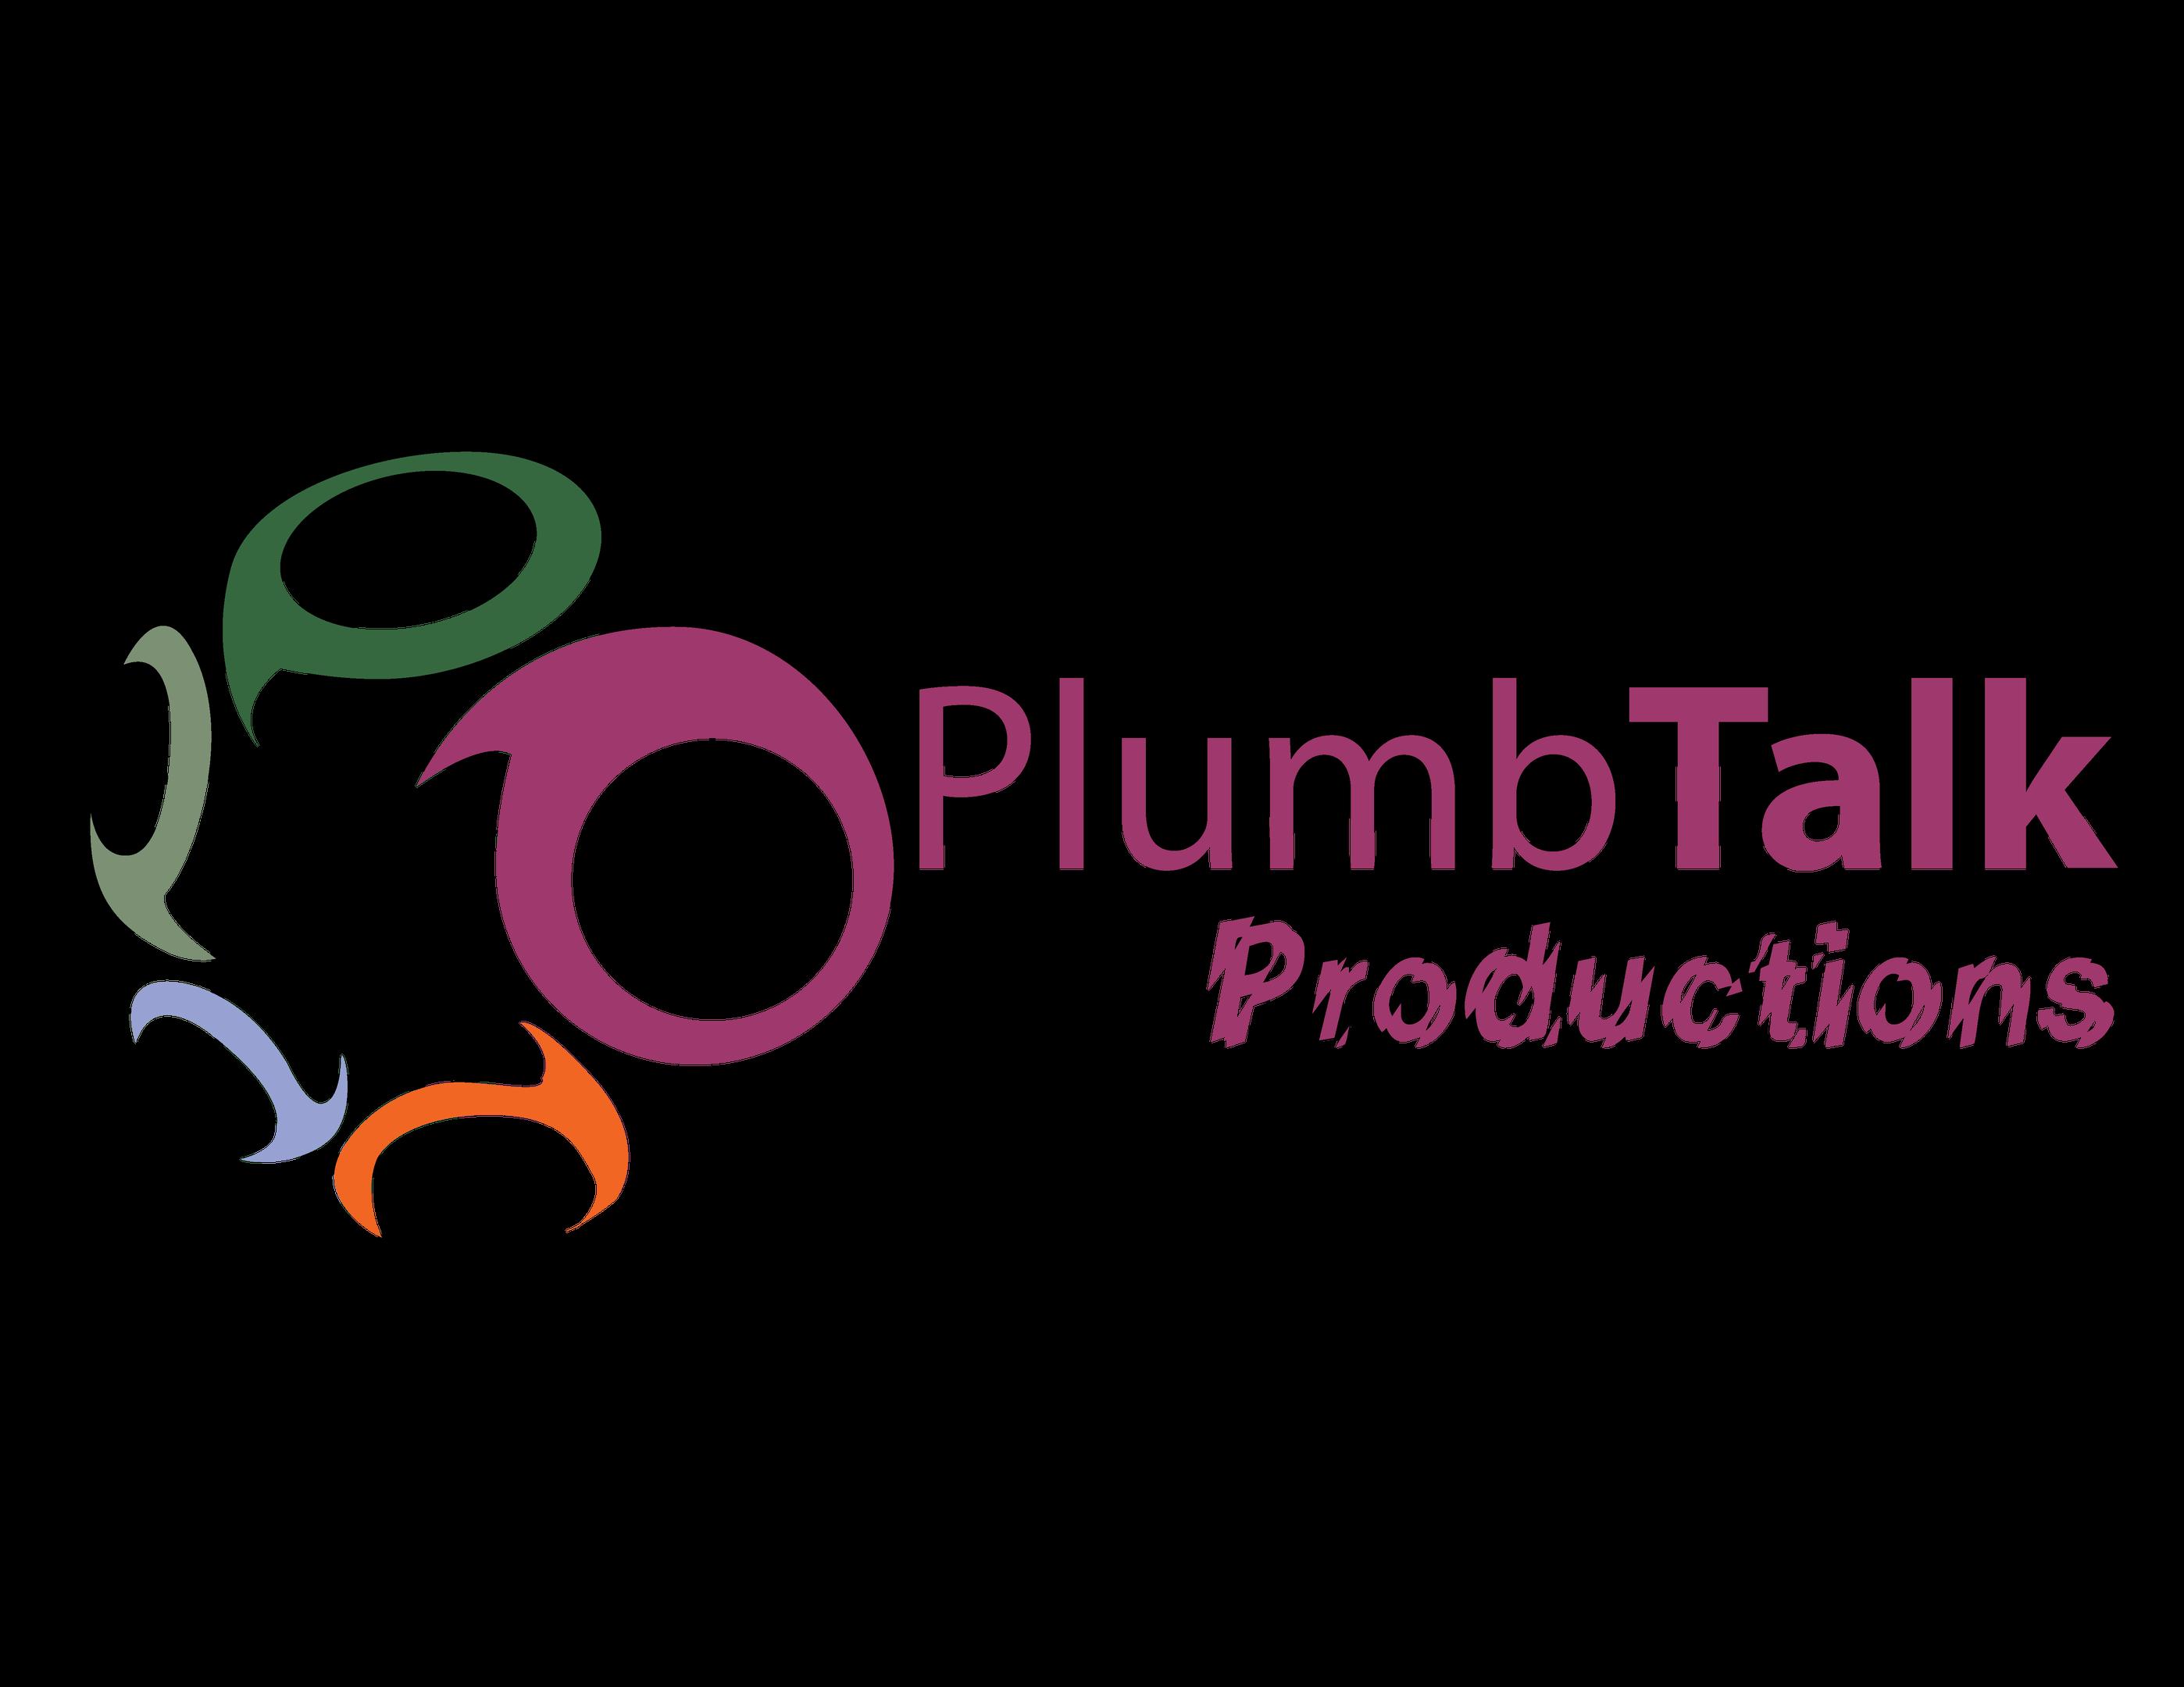 PlumbTalk Productions